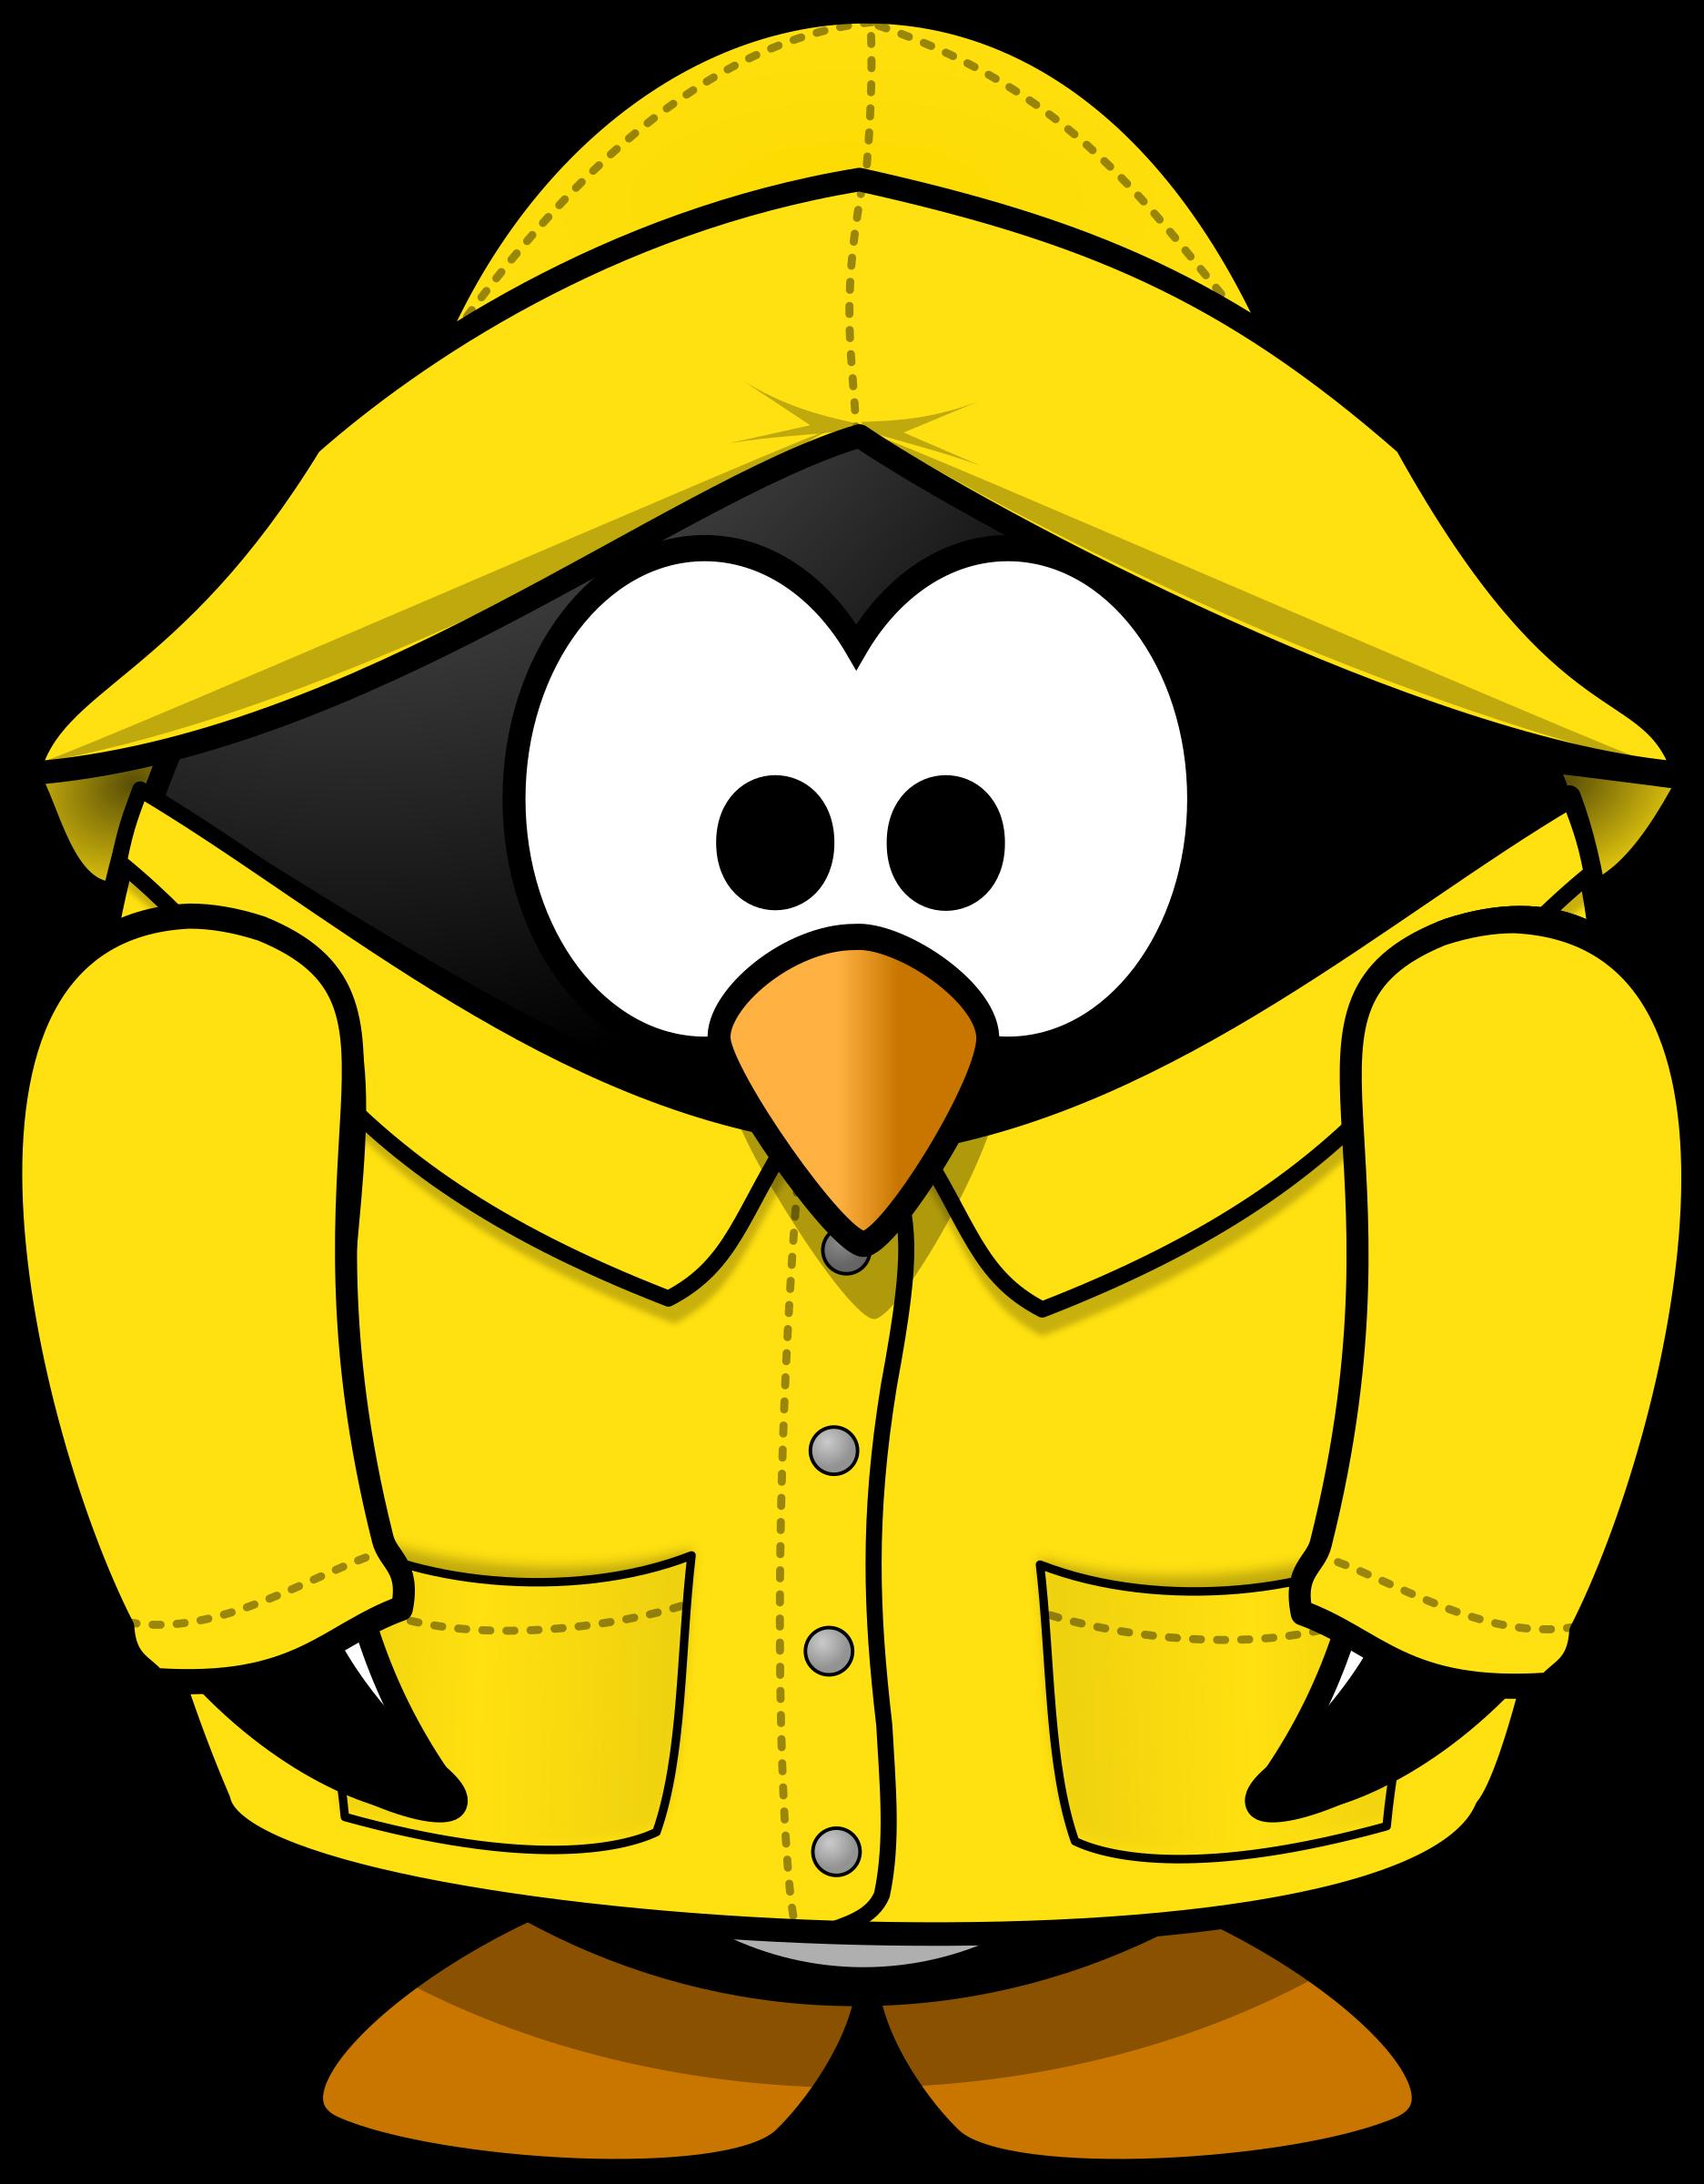 Penguin clipart rain The rain Penguin in the